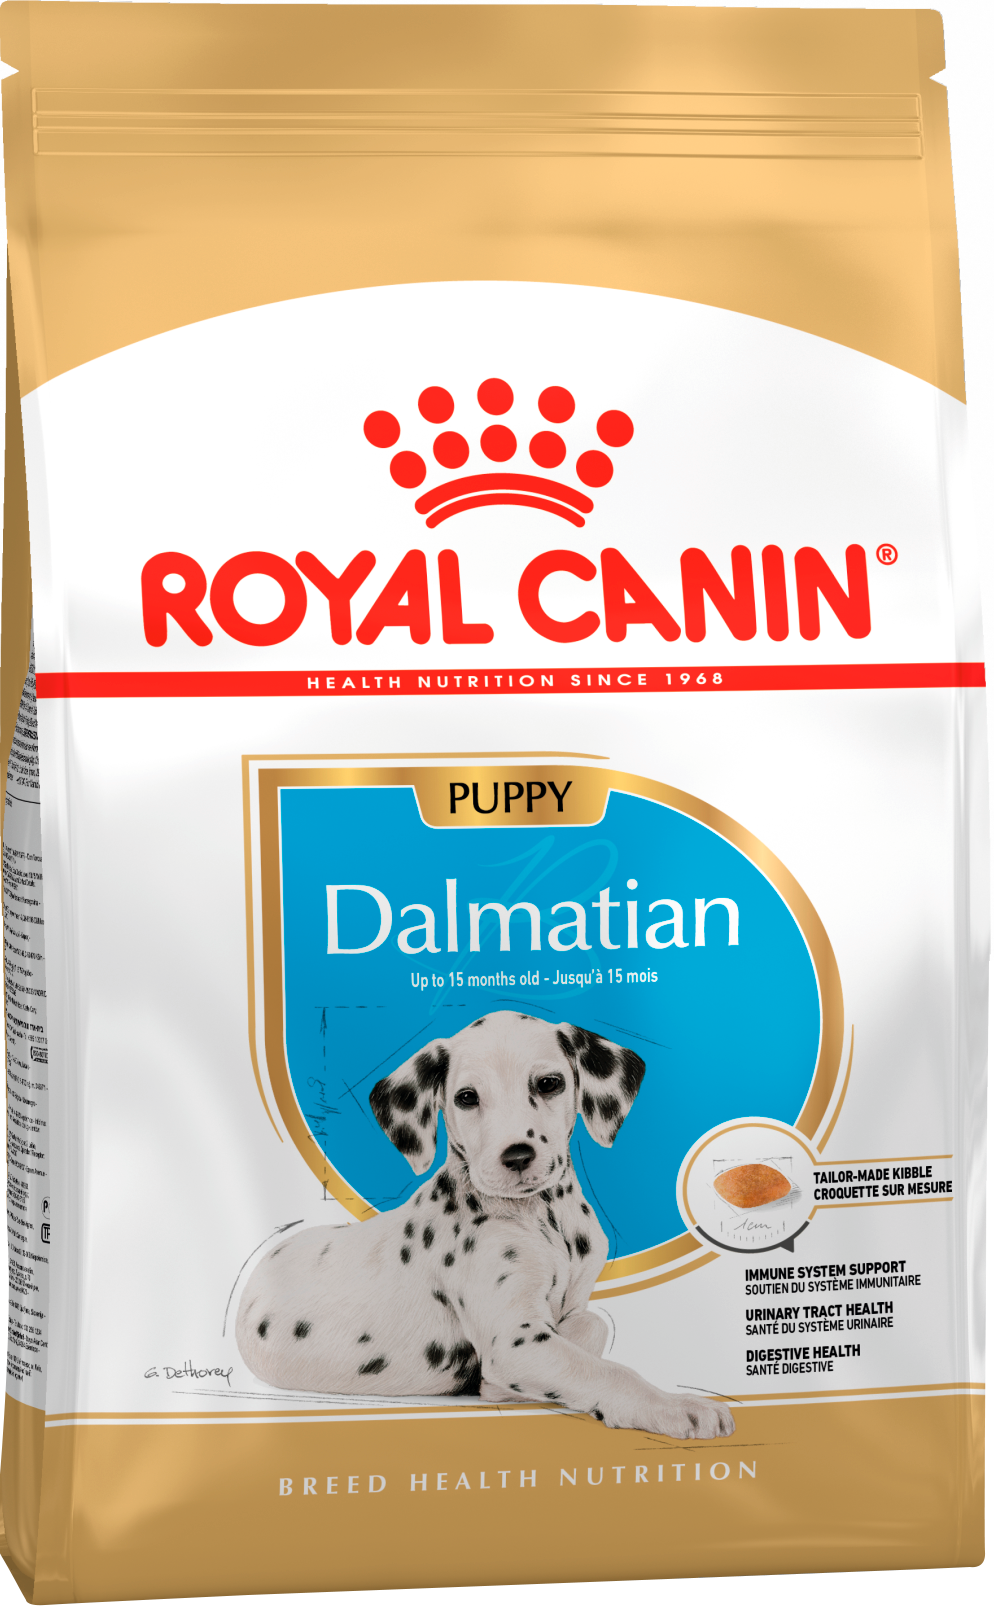 Royal Canin Корм для щенков собак породы далматин, Royal Canin Dalmatian Puppy 378120.png